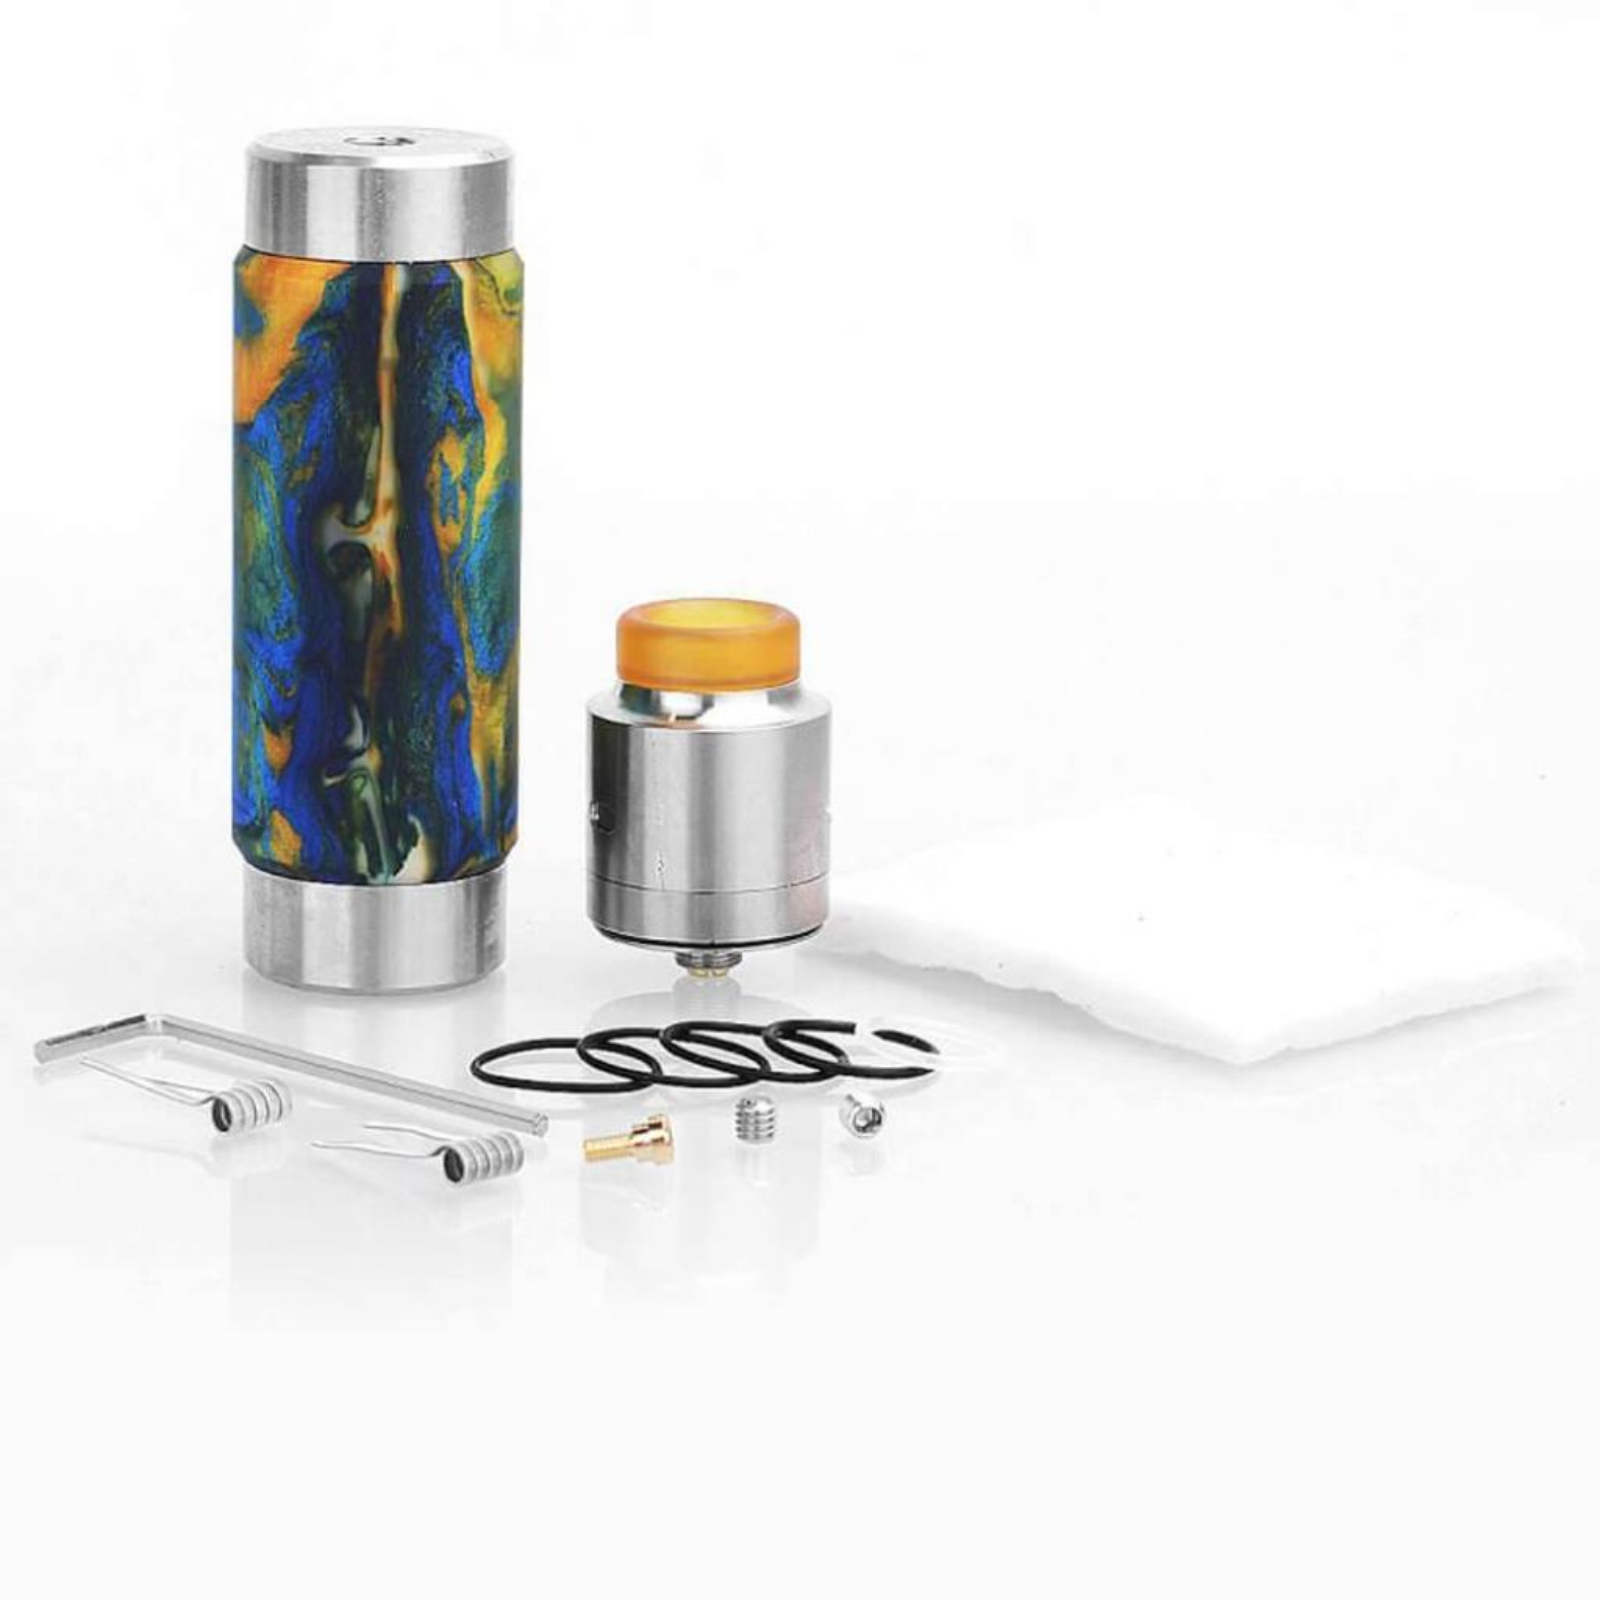 Стартовый набор Wismec Machina RDA Kit Swirled Metallic Resin (WSMCHR) изображение 6